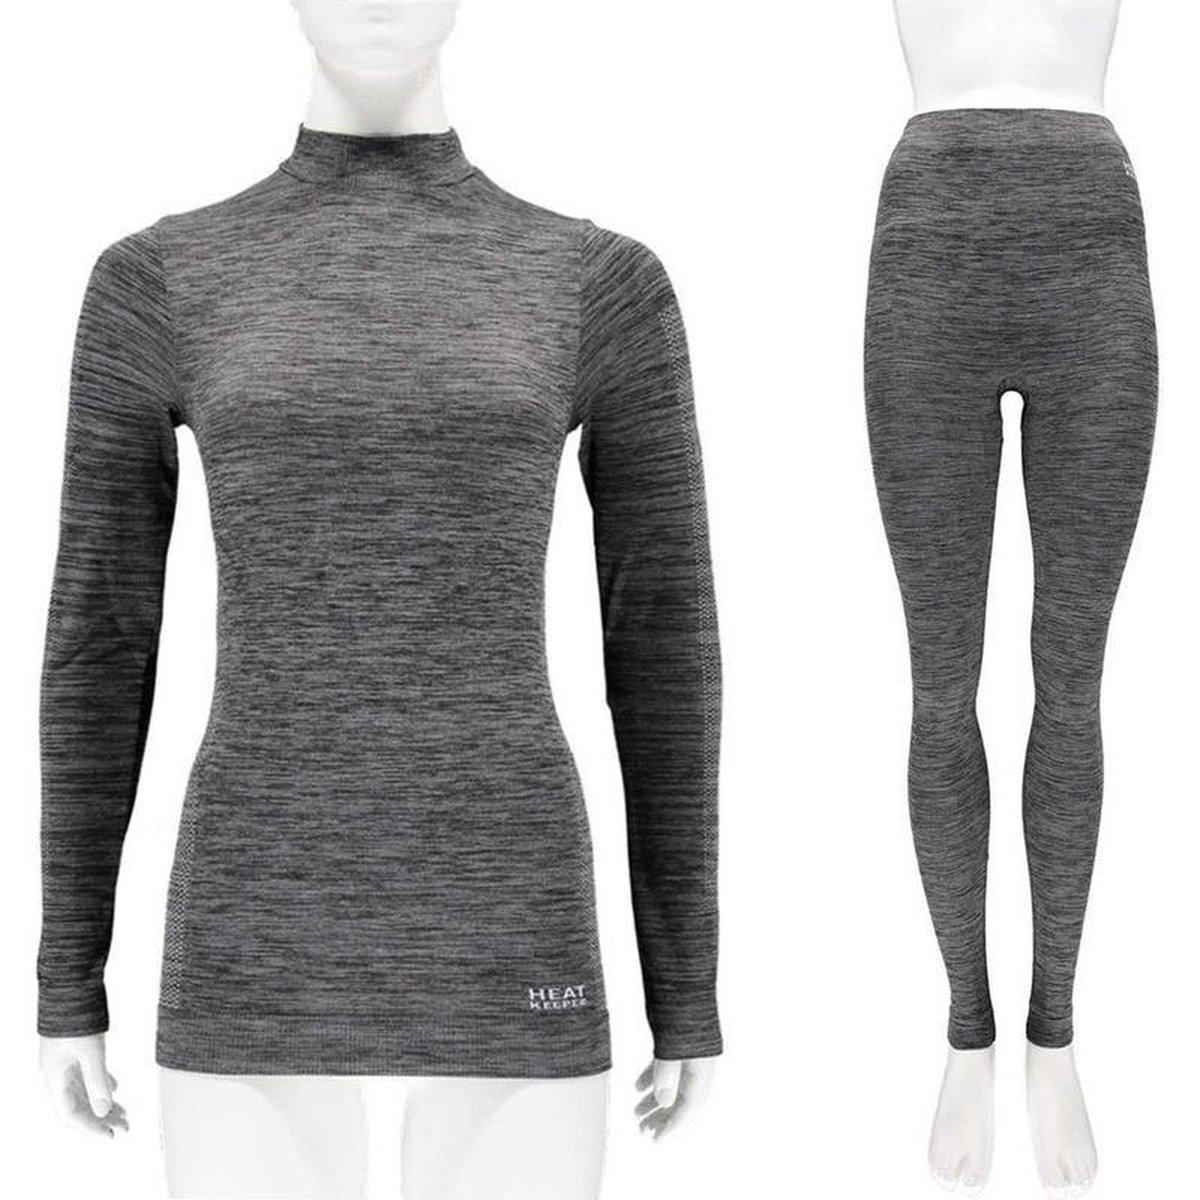 Thermo onderkleding set voor dames zwart melange - maat L - shirt lange mouw en broek - Wintersport kleding - Thermokleding